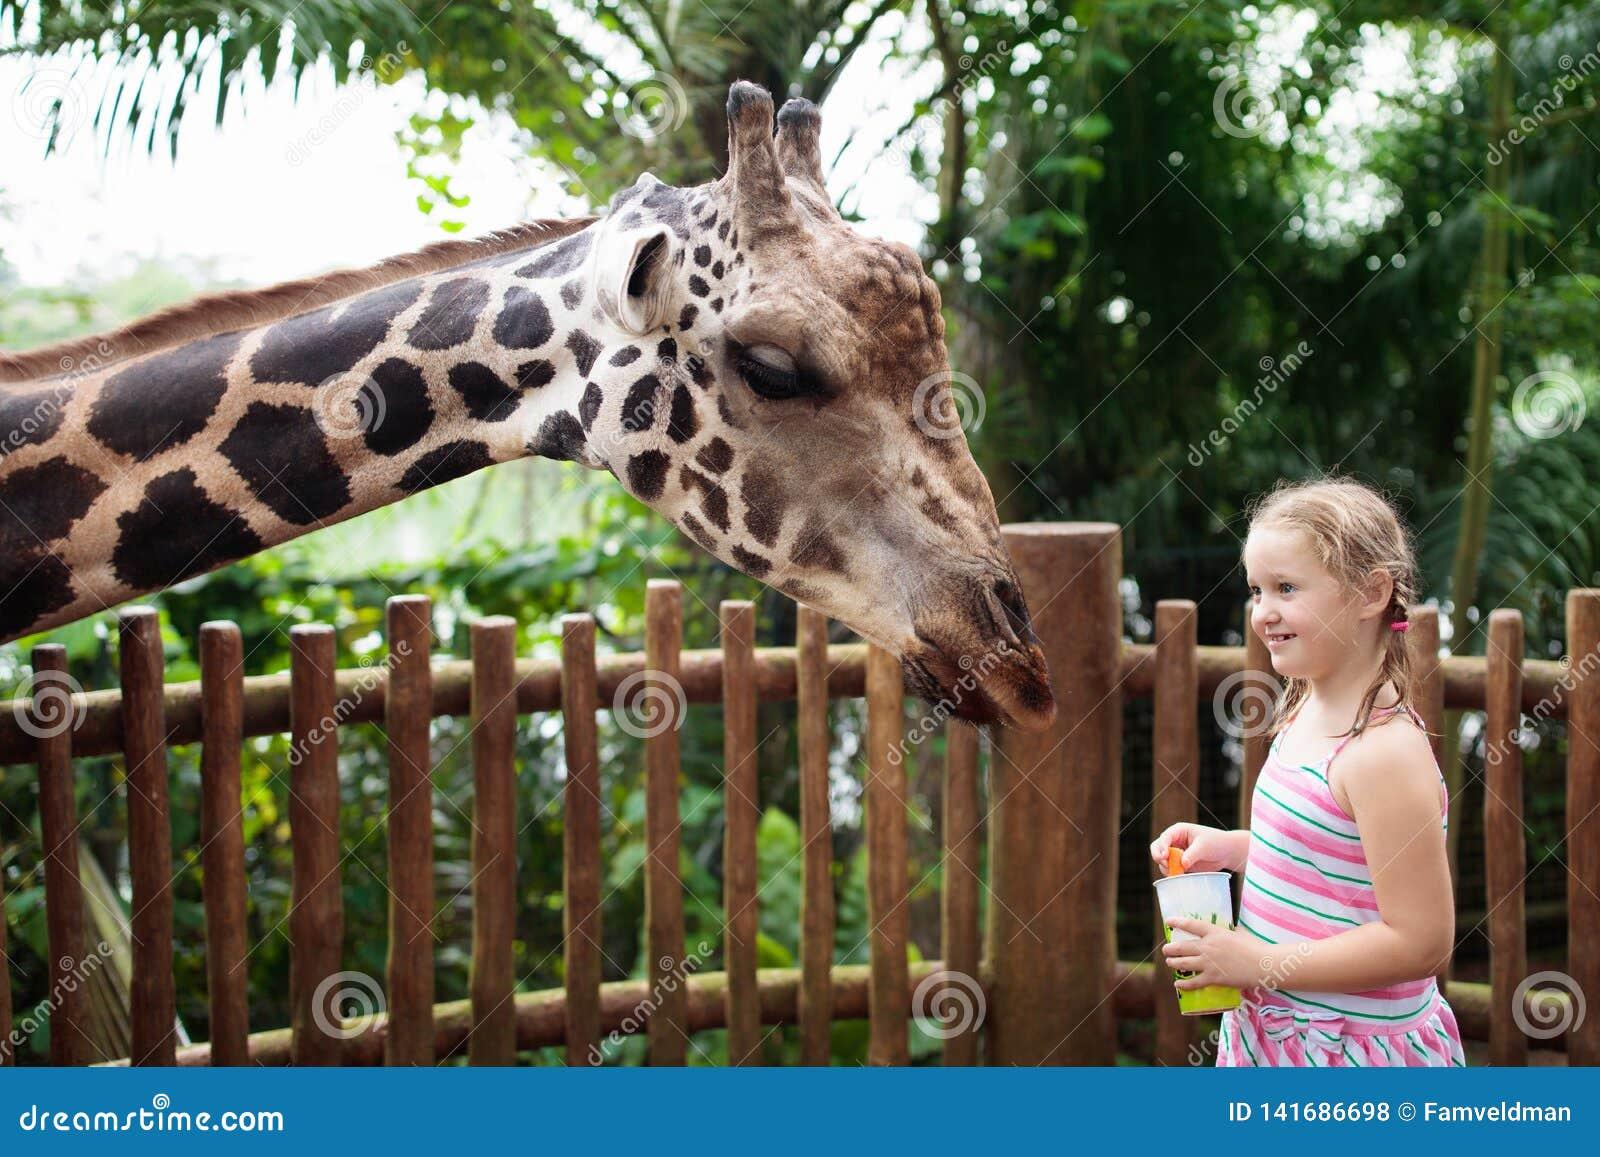 Kids feed giraffe at zoo. Children at safari park